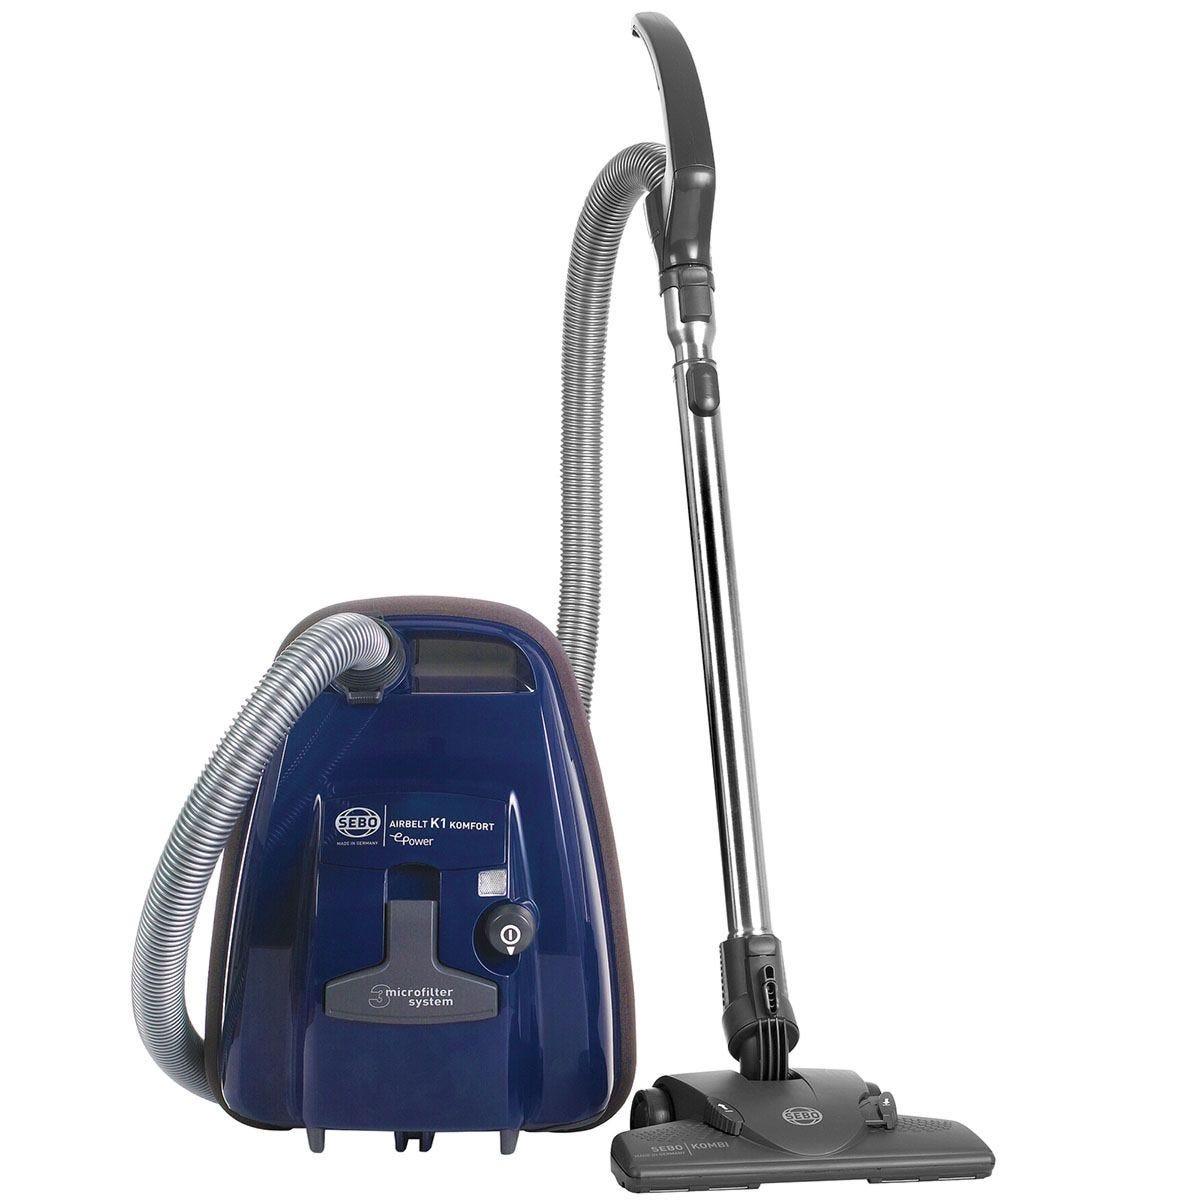 Sebo EB2664 890W Airbelt K1 Komfort EPower Bagged Vacuum Cleaner - Navy Blue